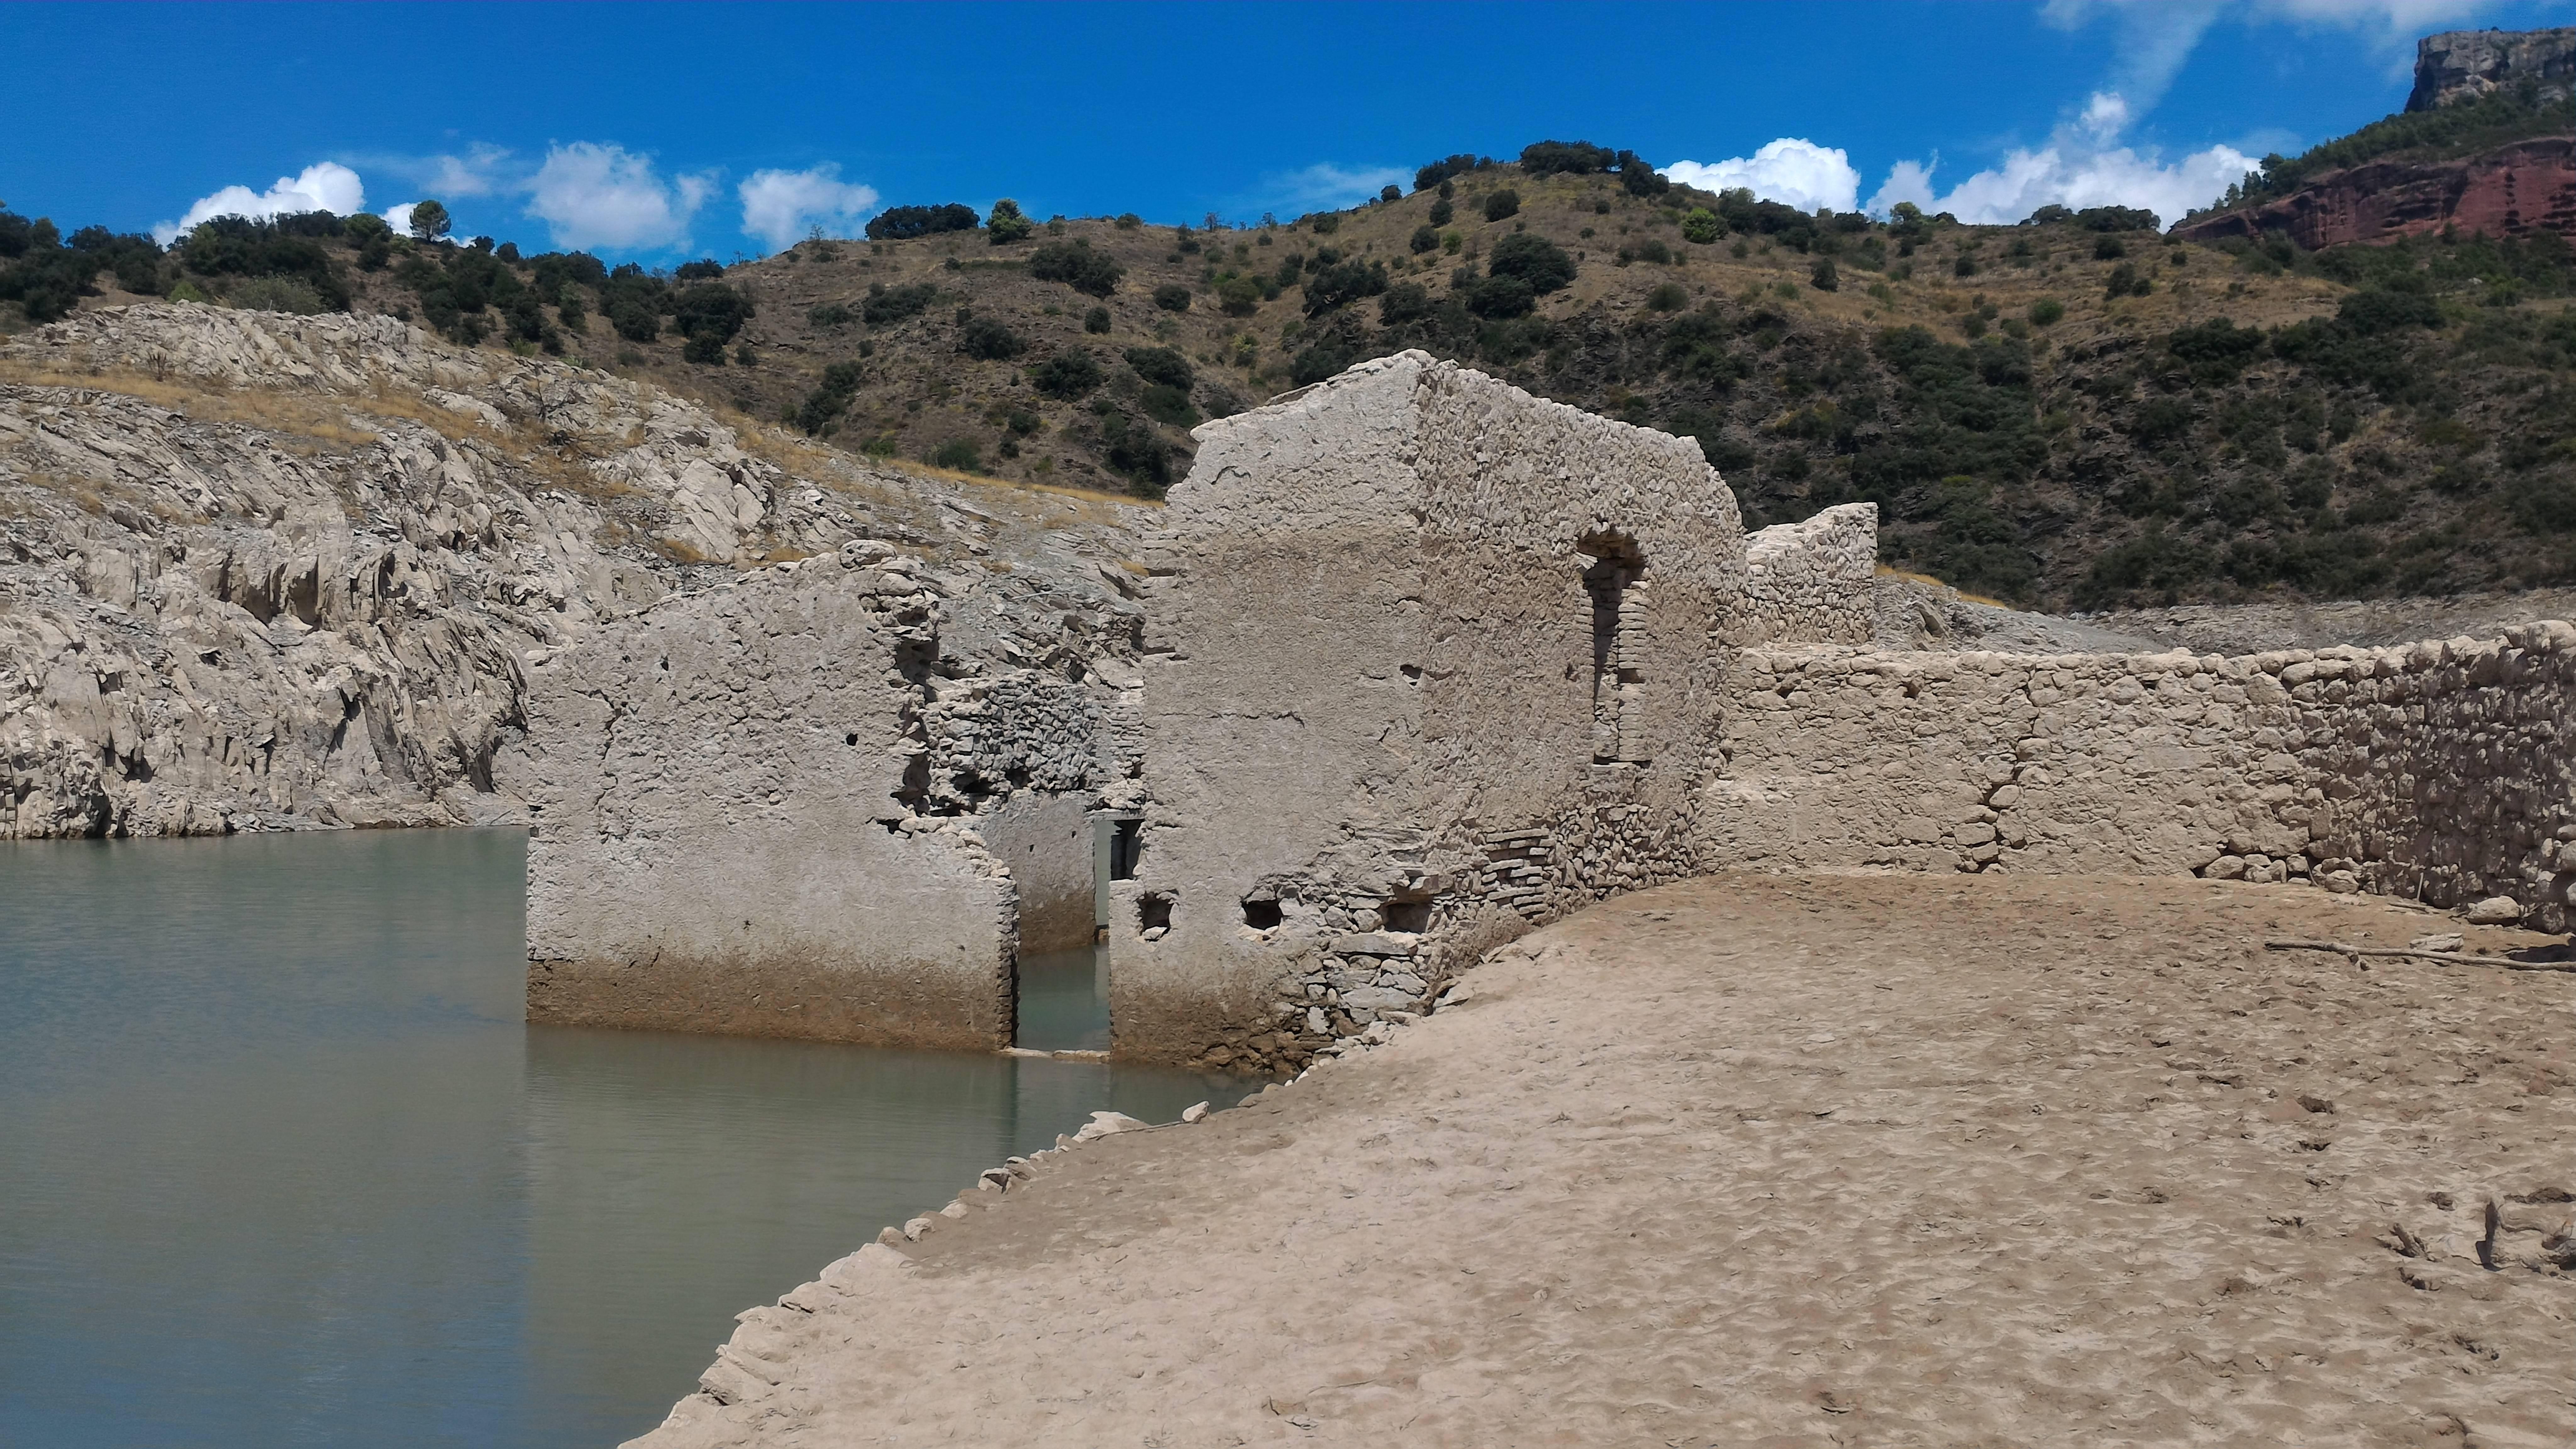 Photo 1: Le Barrage de la Siurana